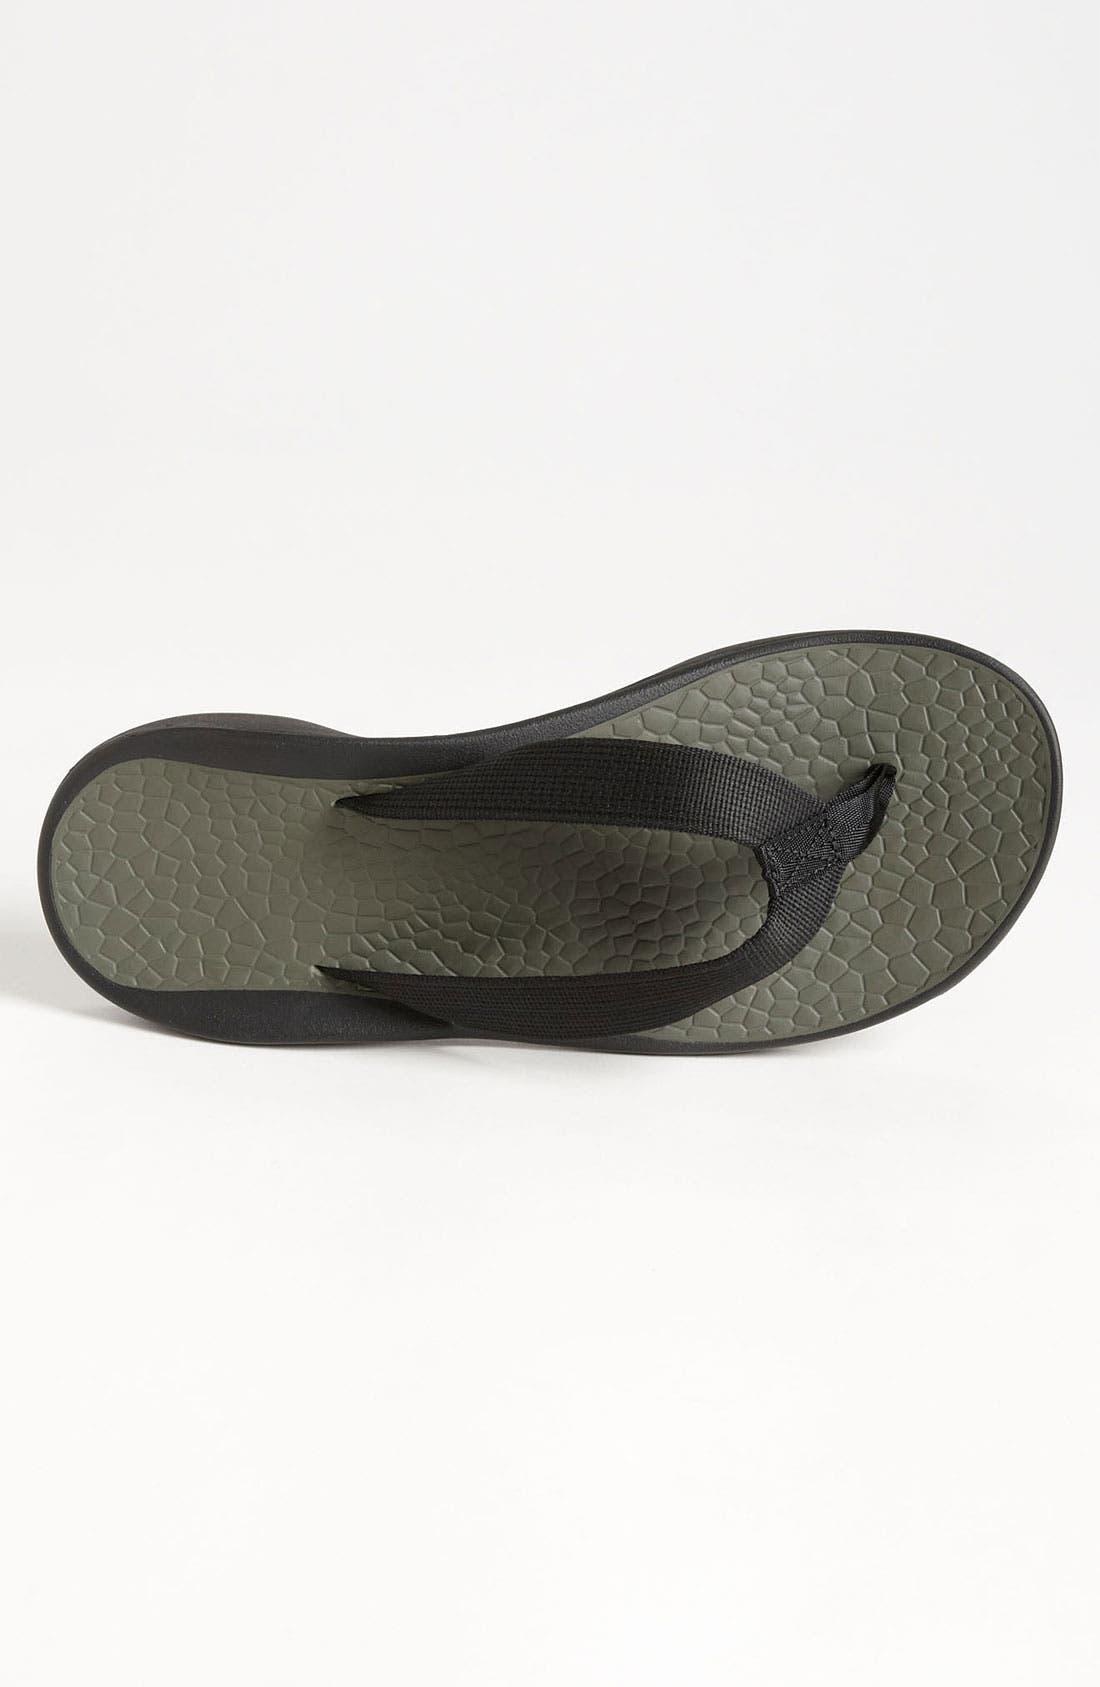 Alternate Image 3  - Chaco 'Fathom' Flip Flop (Men)